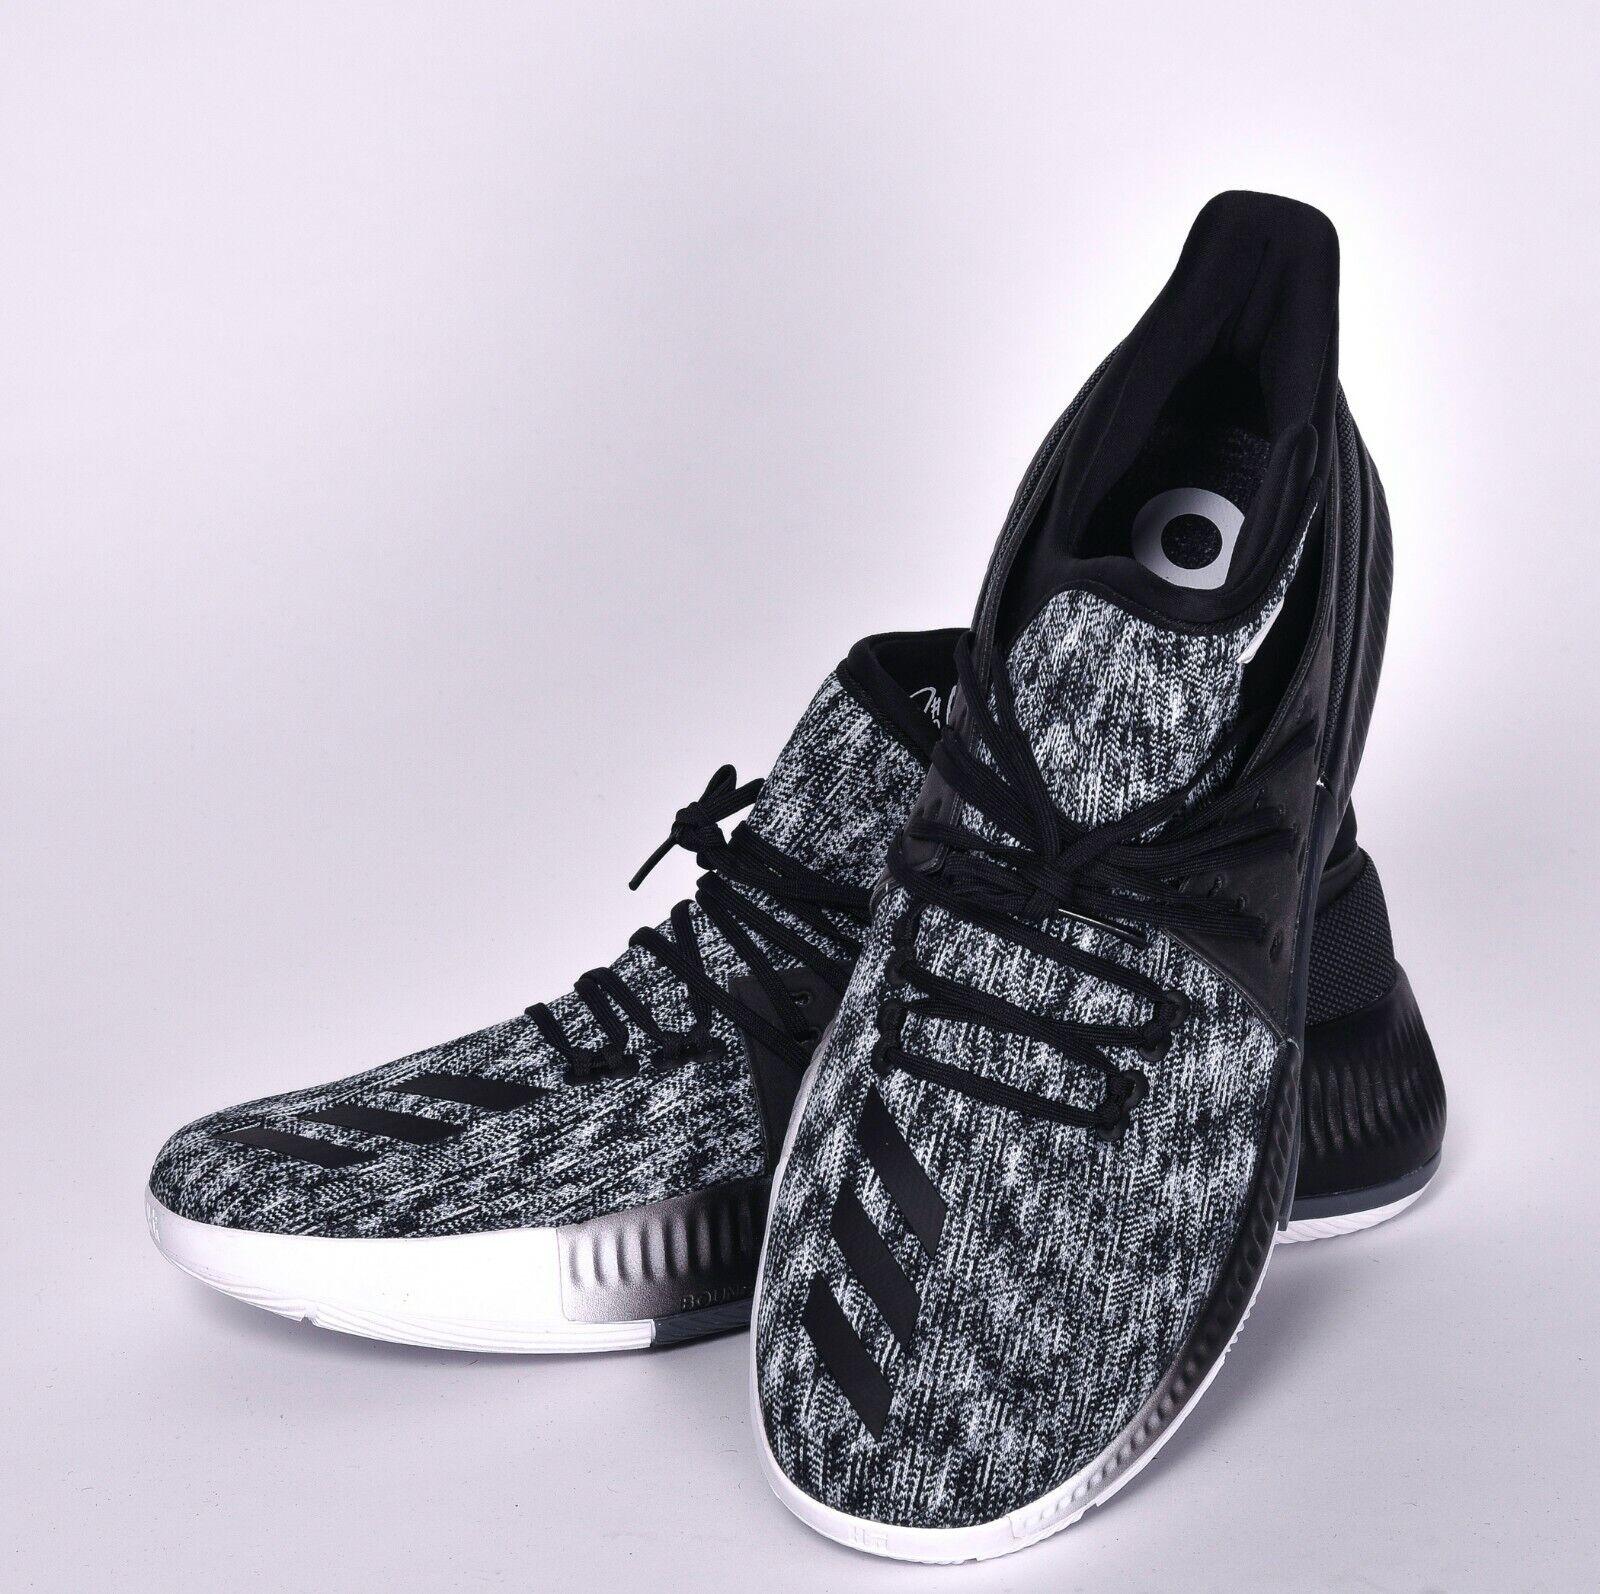 a5dde16b1 FR53 Stylish Adidas Oakland Ogden Oregon Basketball Basketball Basketball  bounce shoes.US18. UK17.